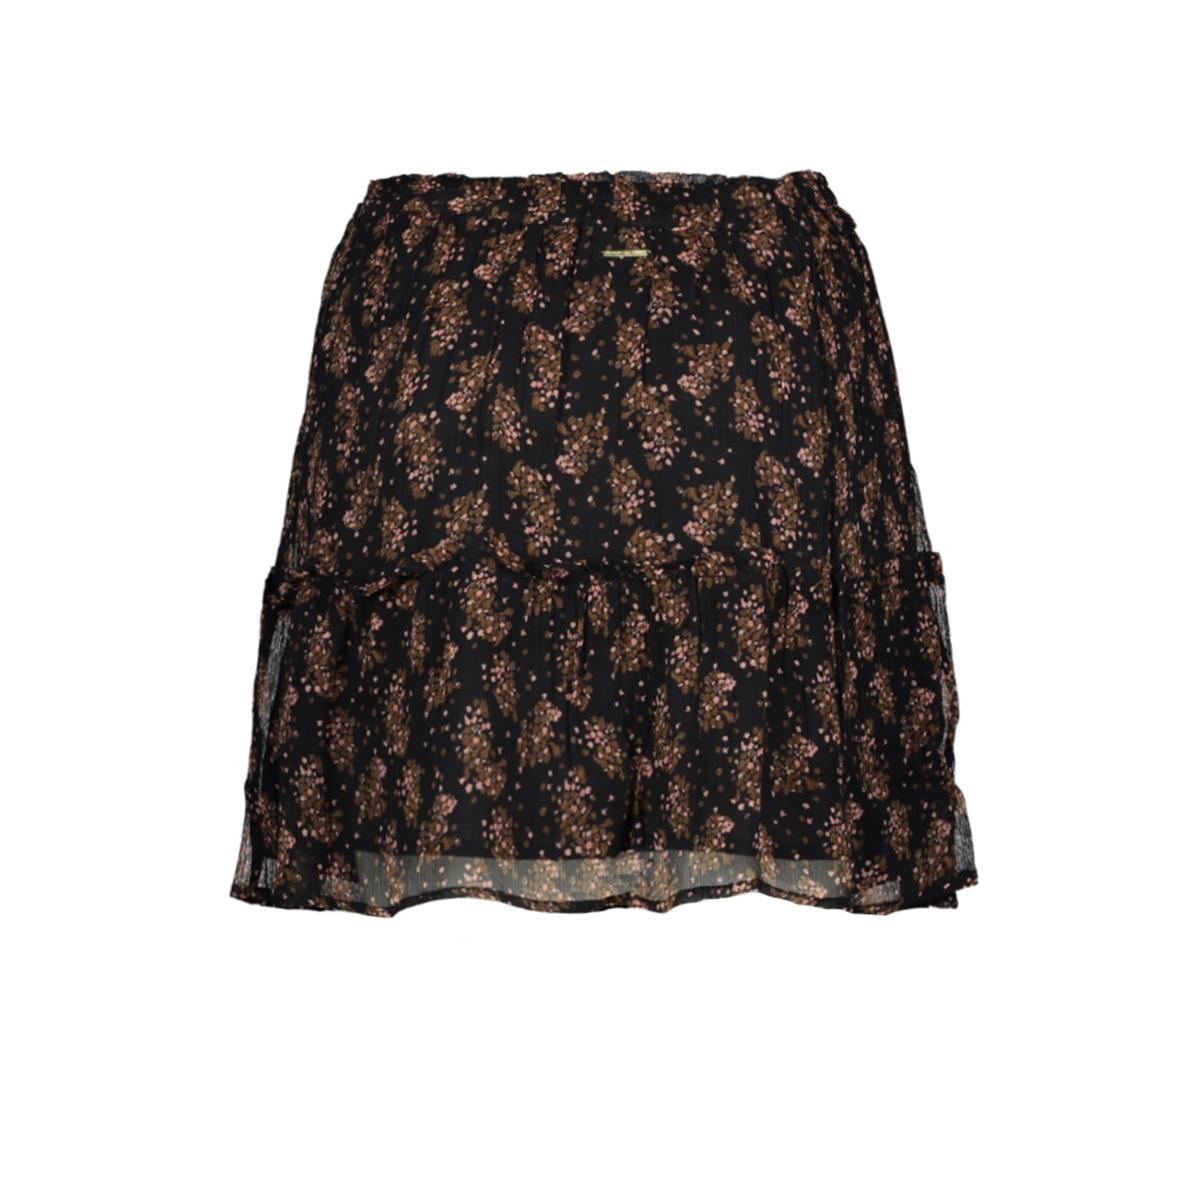 fern skirt s20 36 circle of trust rok 2061 flower wall